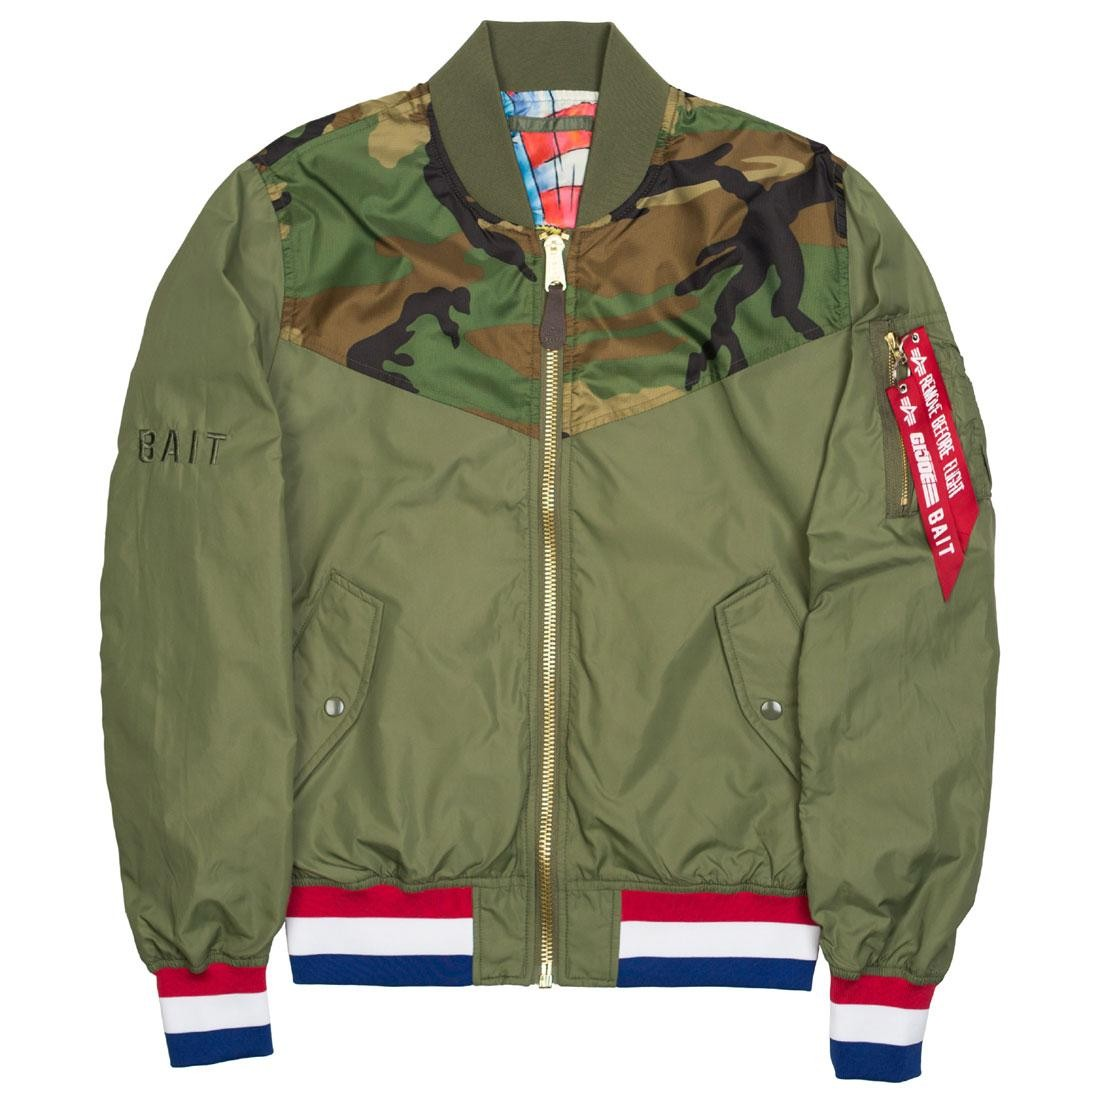 b4d8299e2fd4 BAIT x Alpha Industries x GI JOE Men L2B Scout Military Reversible Jacket  green olive